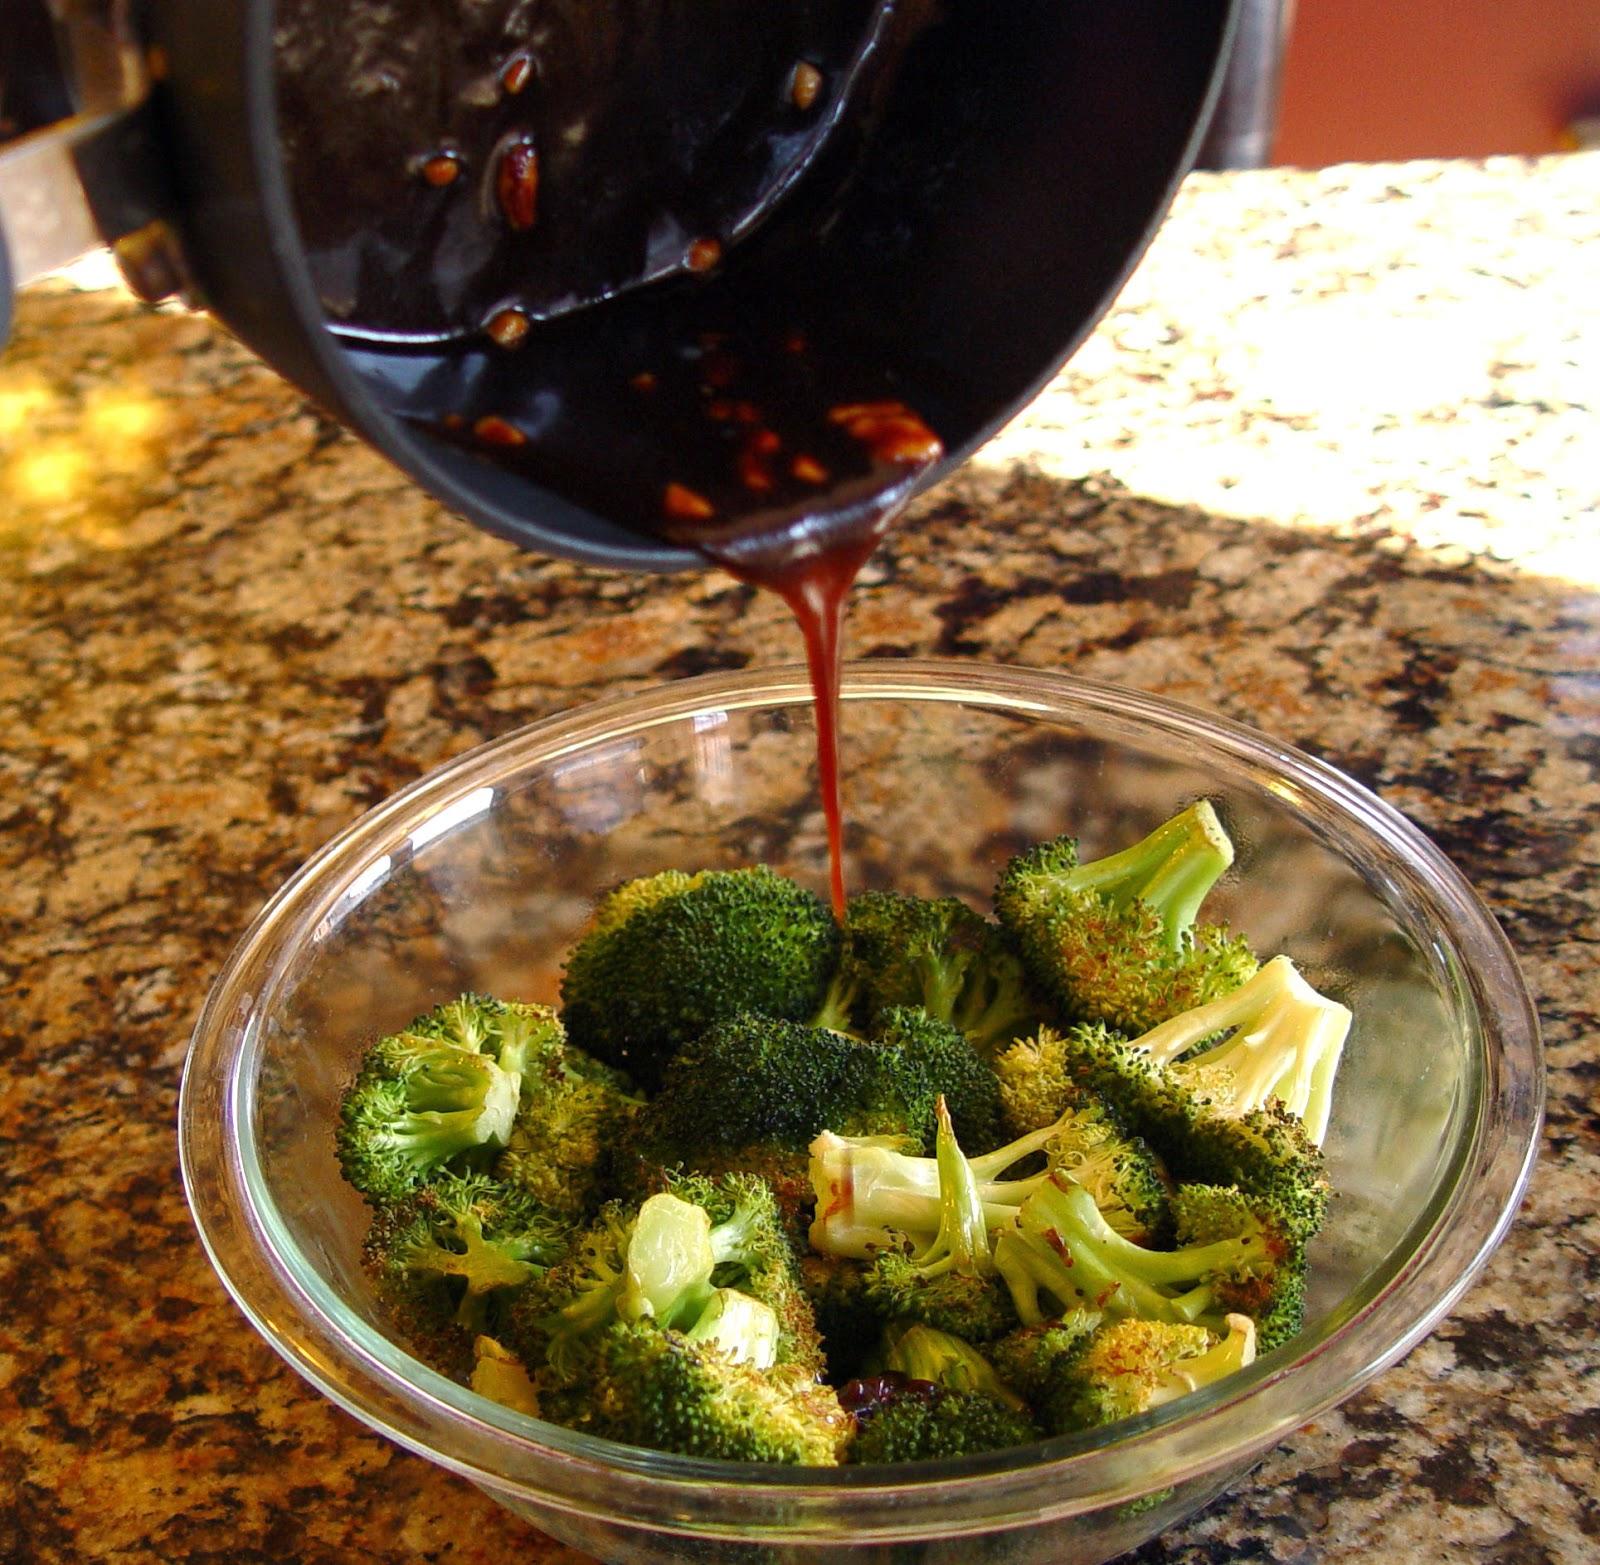 Roasted Broccoli with Balsamic and Sesame Glaze